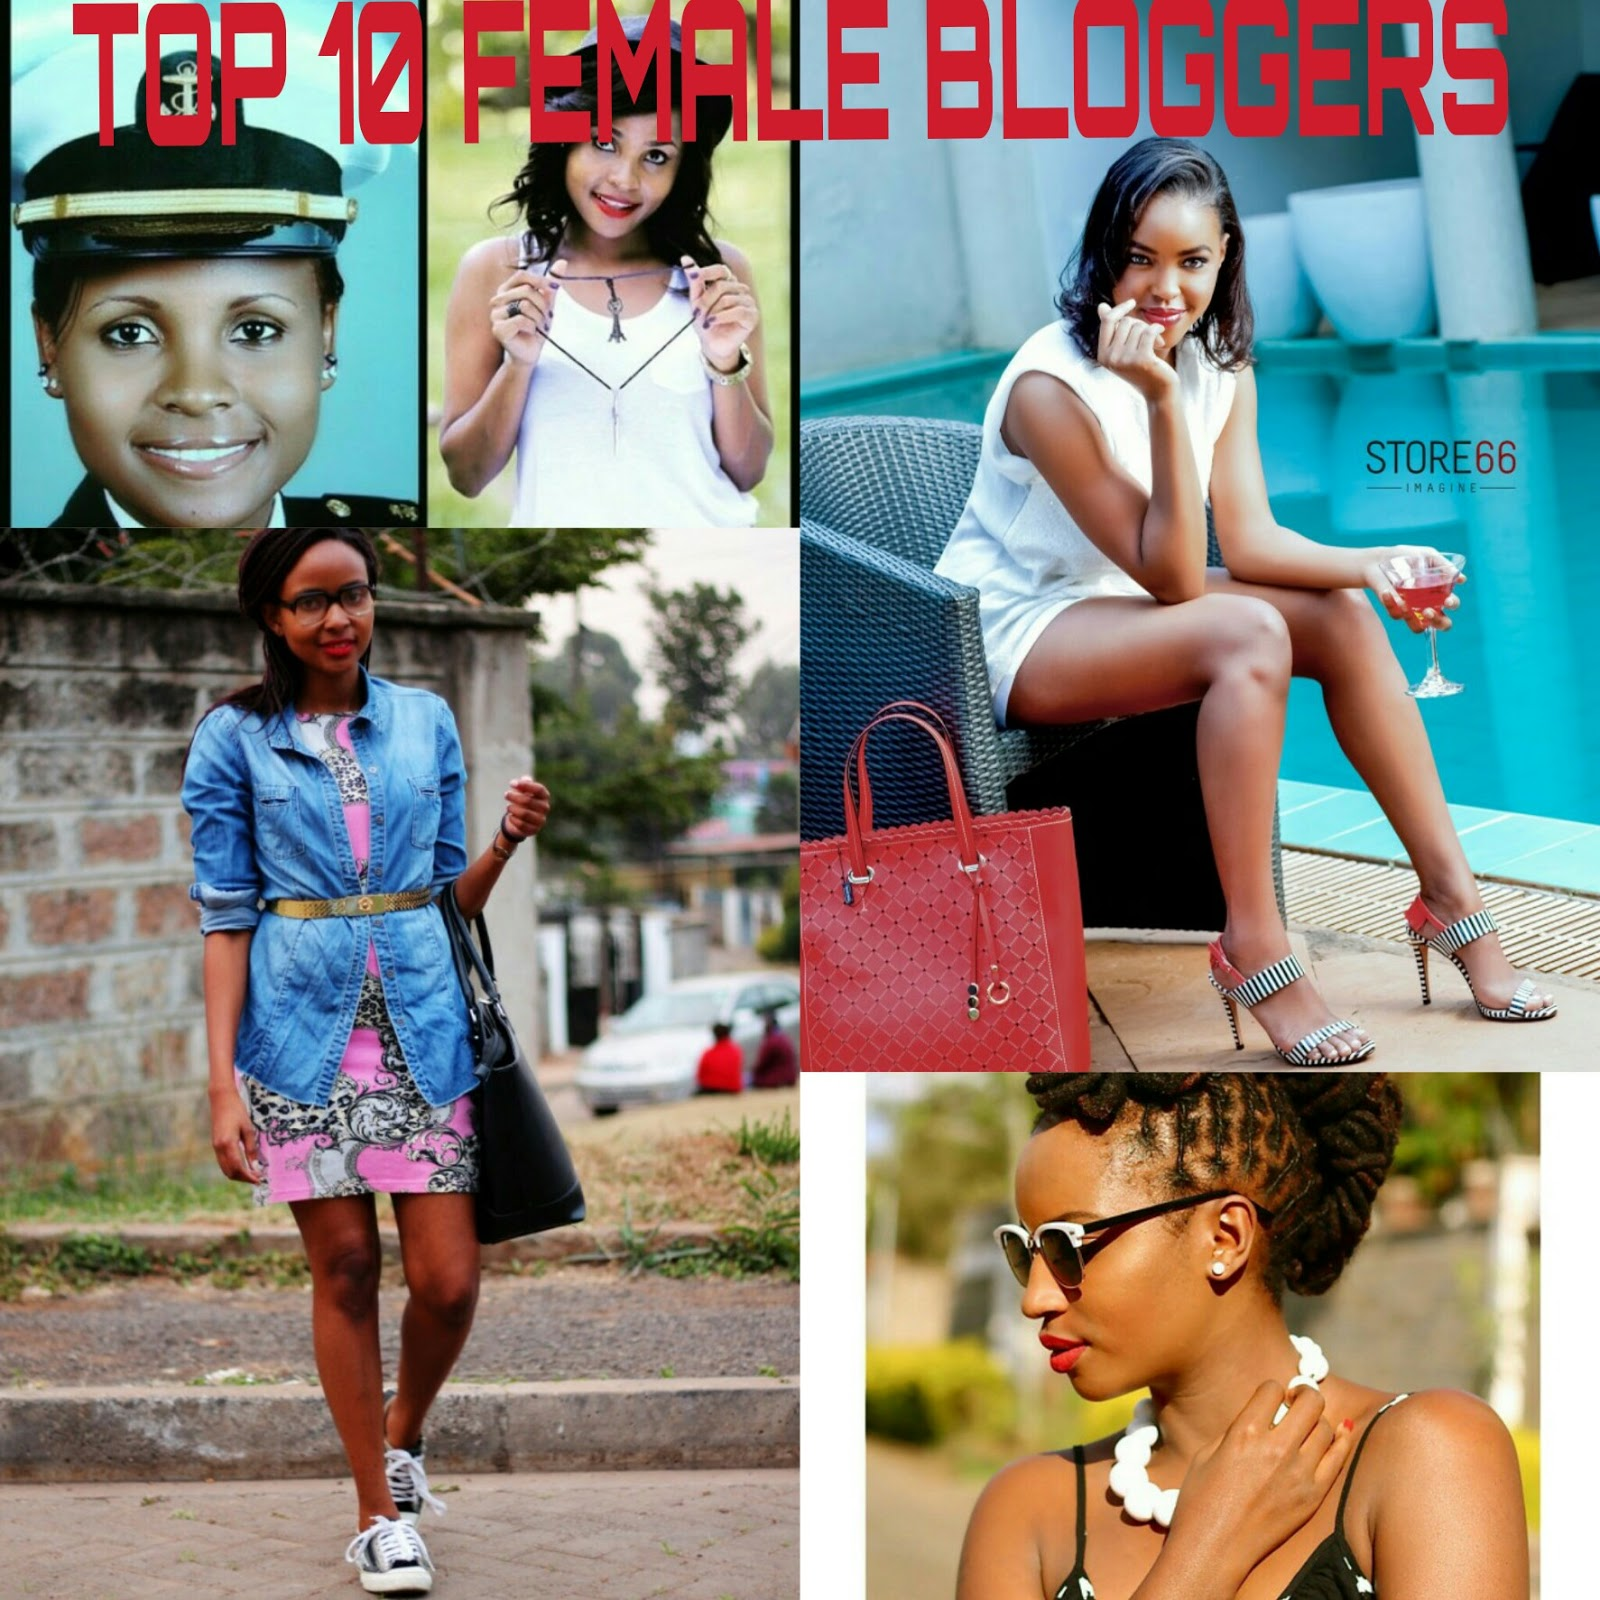 Top 10 fashion bloggers - Top 10 Female Fashion Bloggers In Kenya